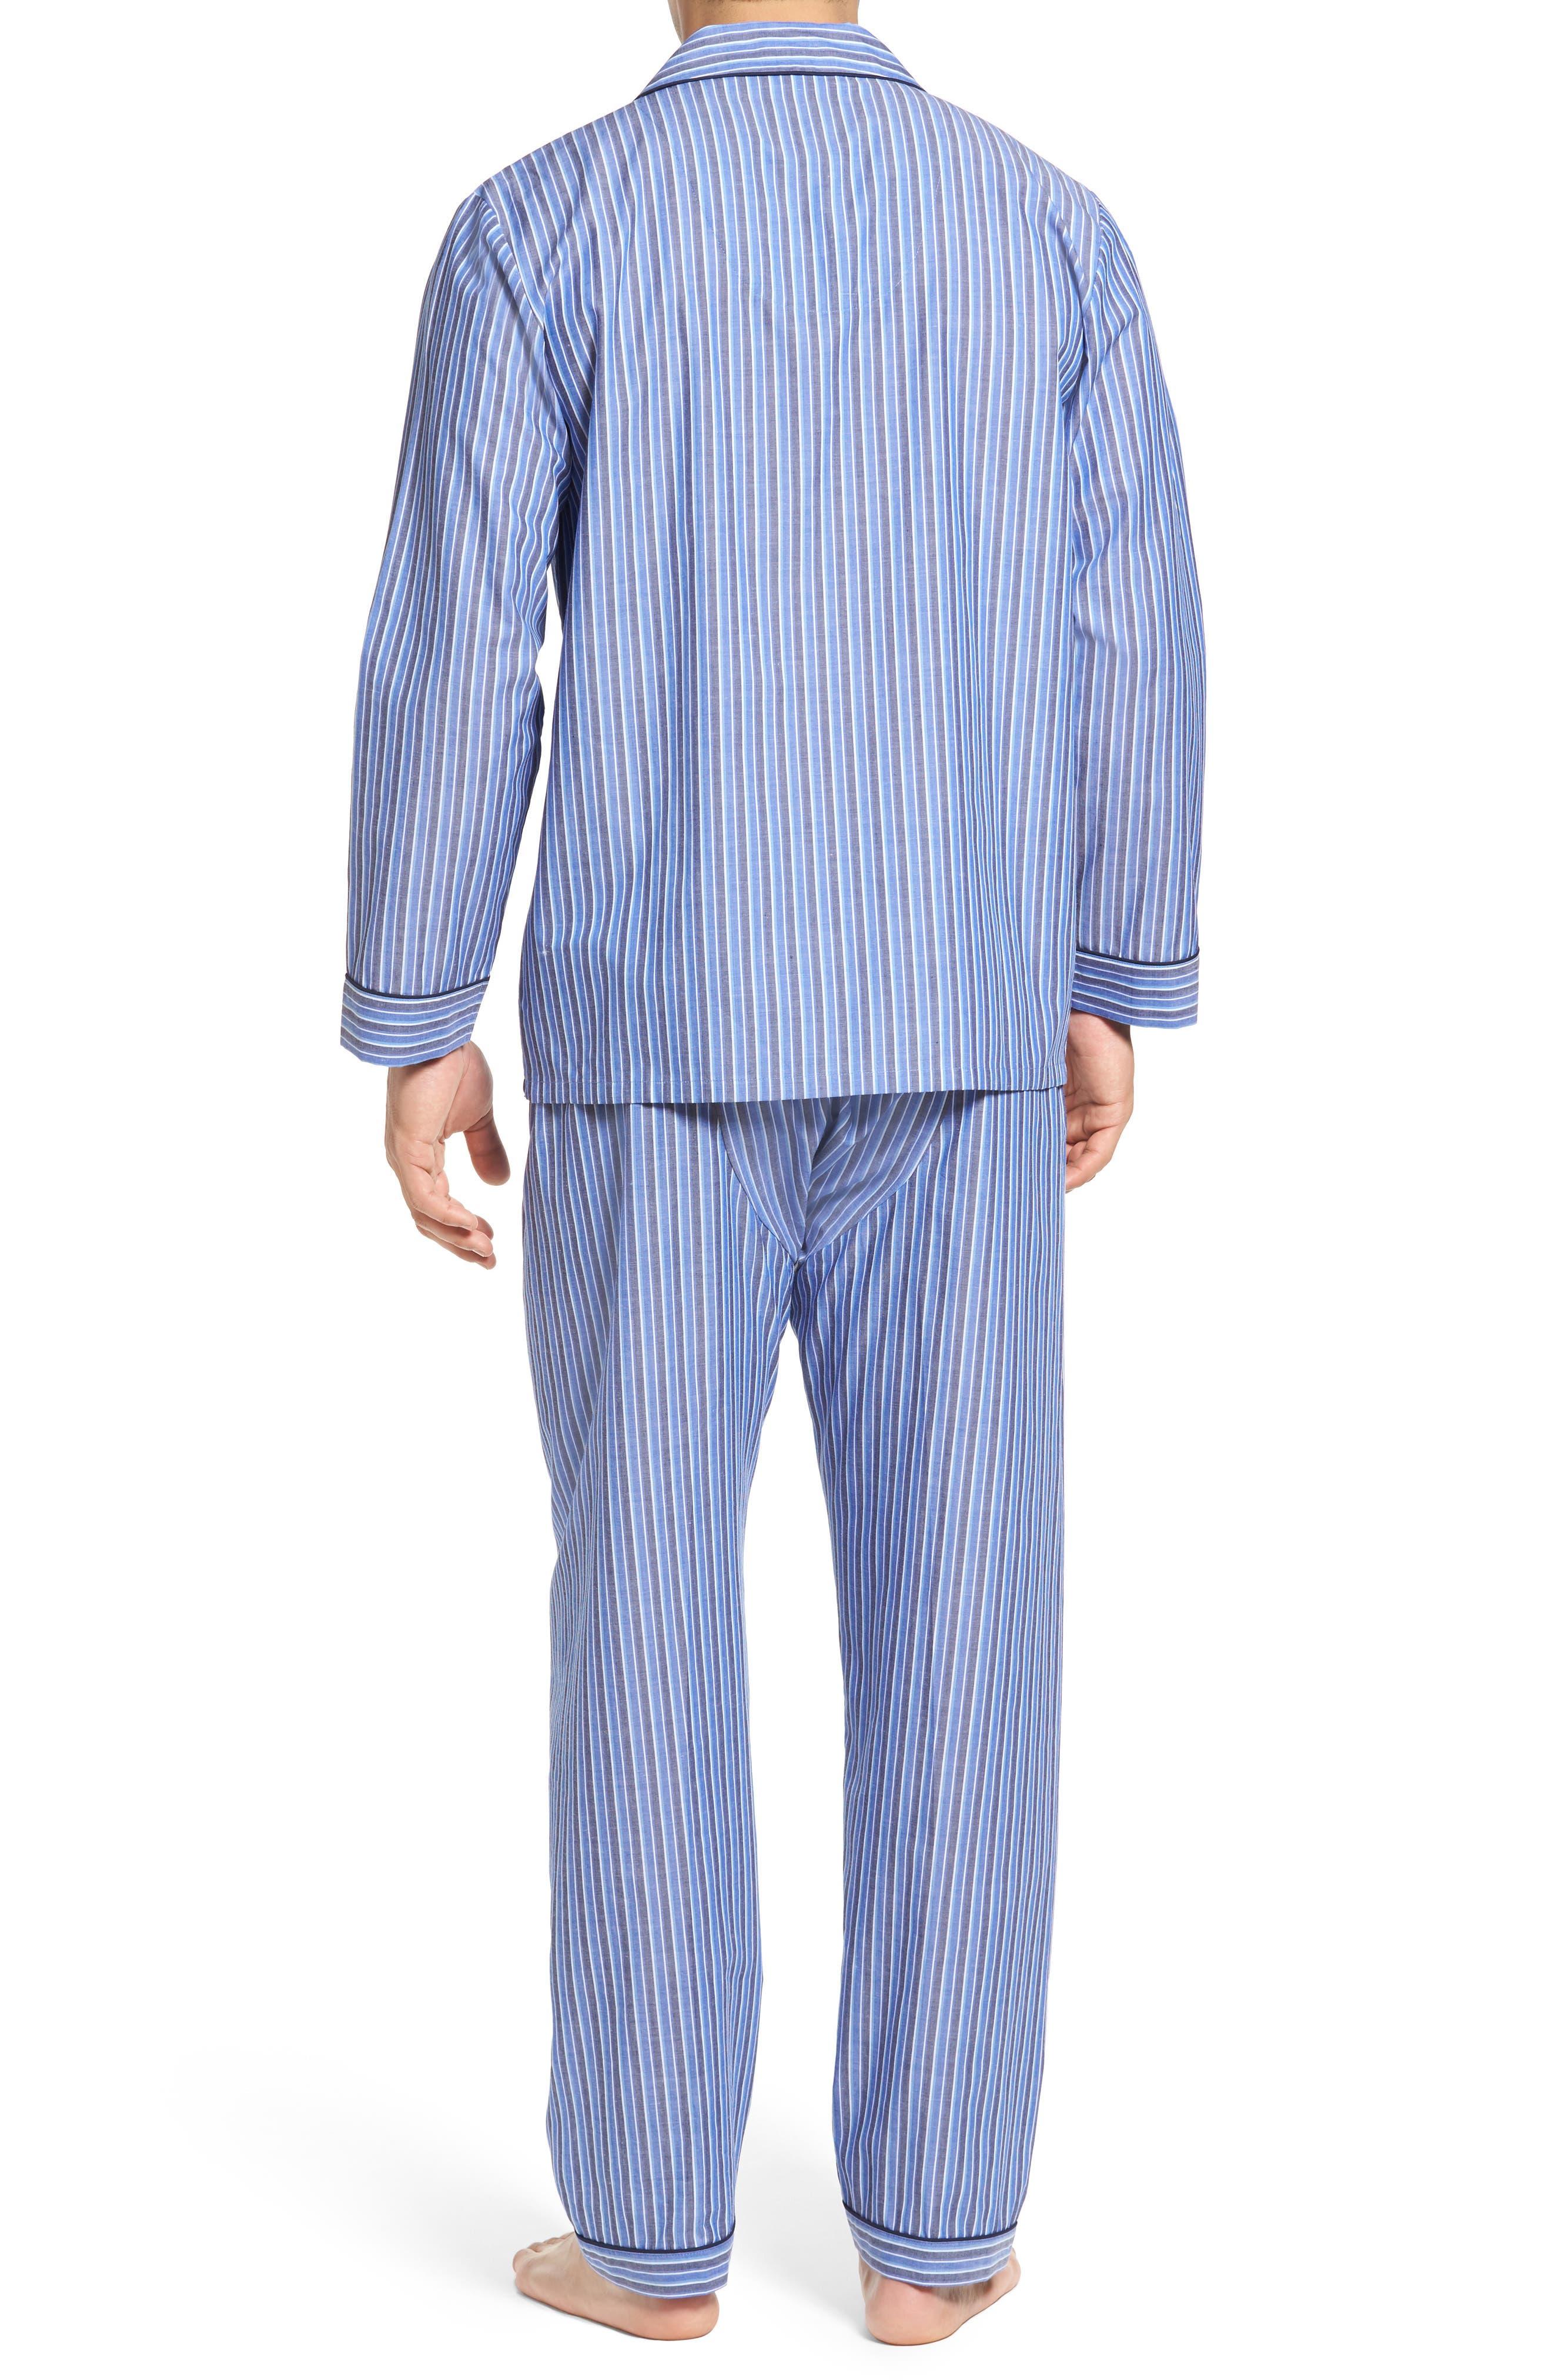 Cole Cotton Blend Pajama Set,                             Alternate thumbnail 2, color,                             Royal Stripe